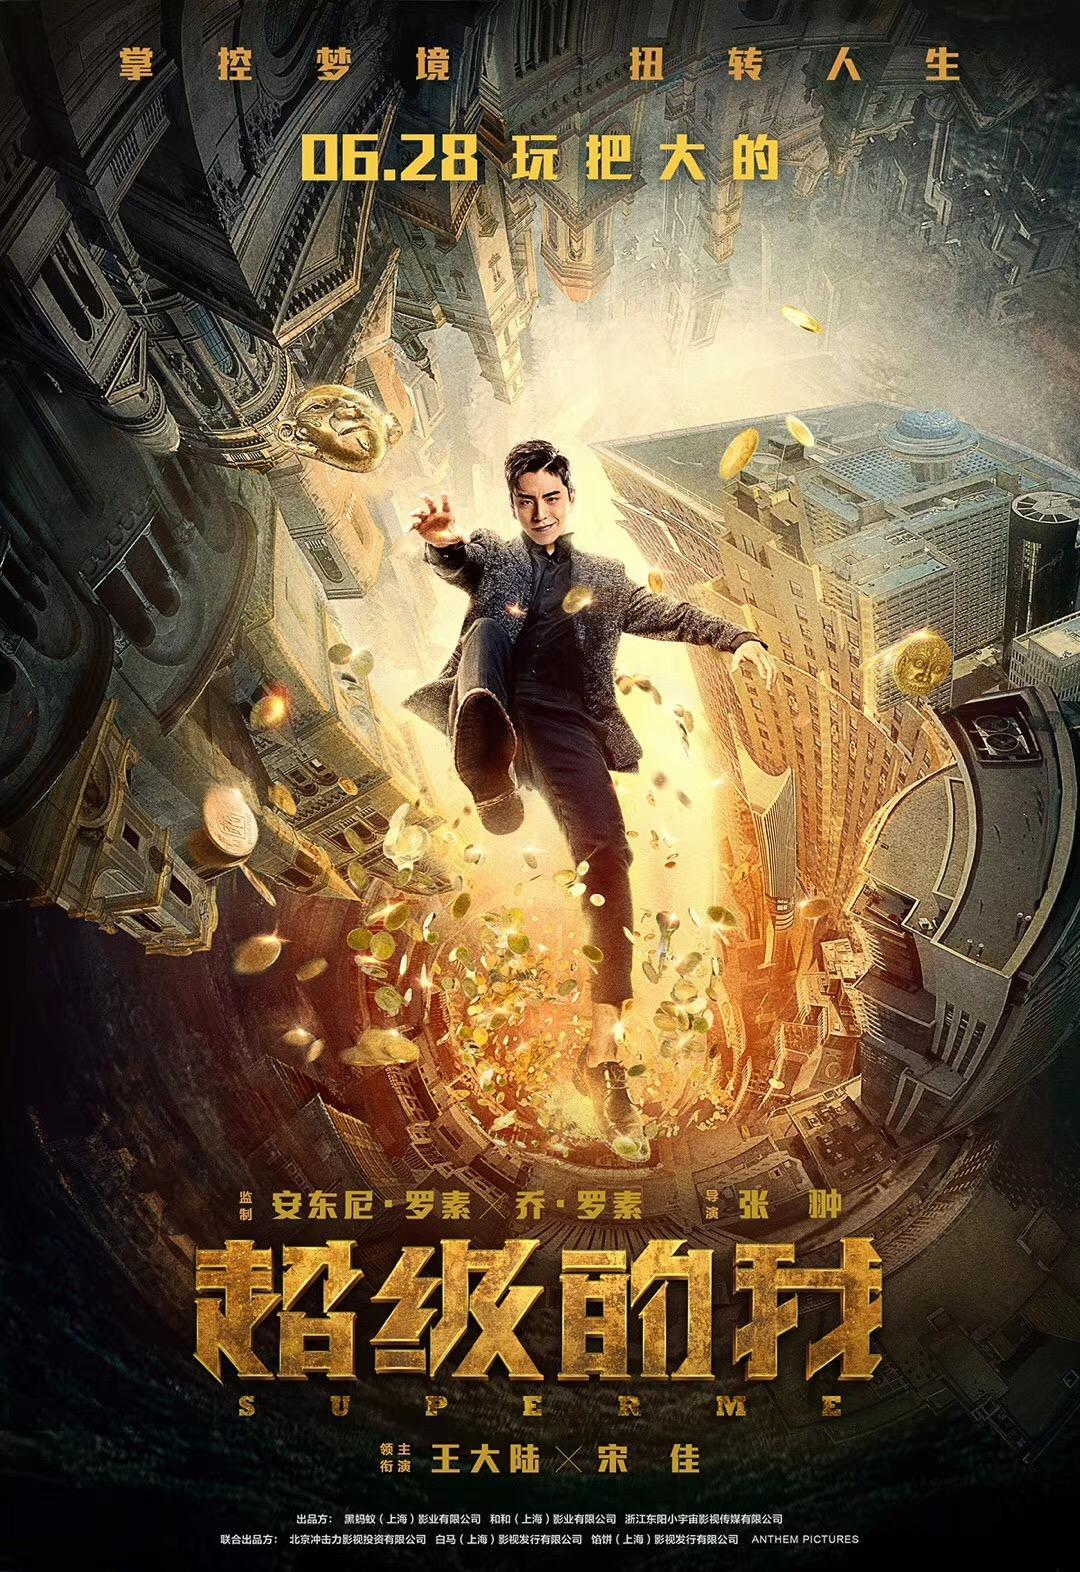 Download Filme Super Me Torrent 2021 Qualidade Hd